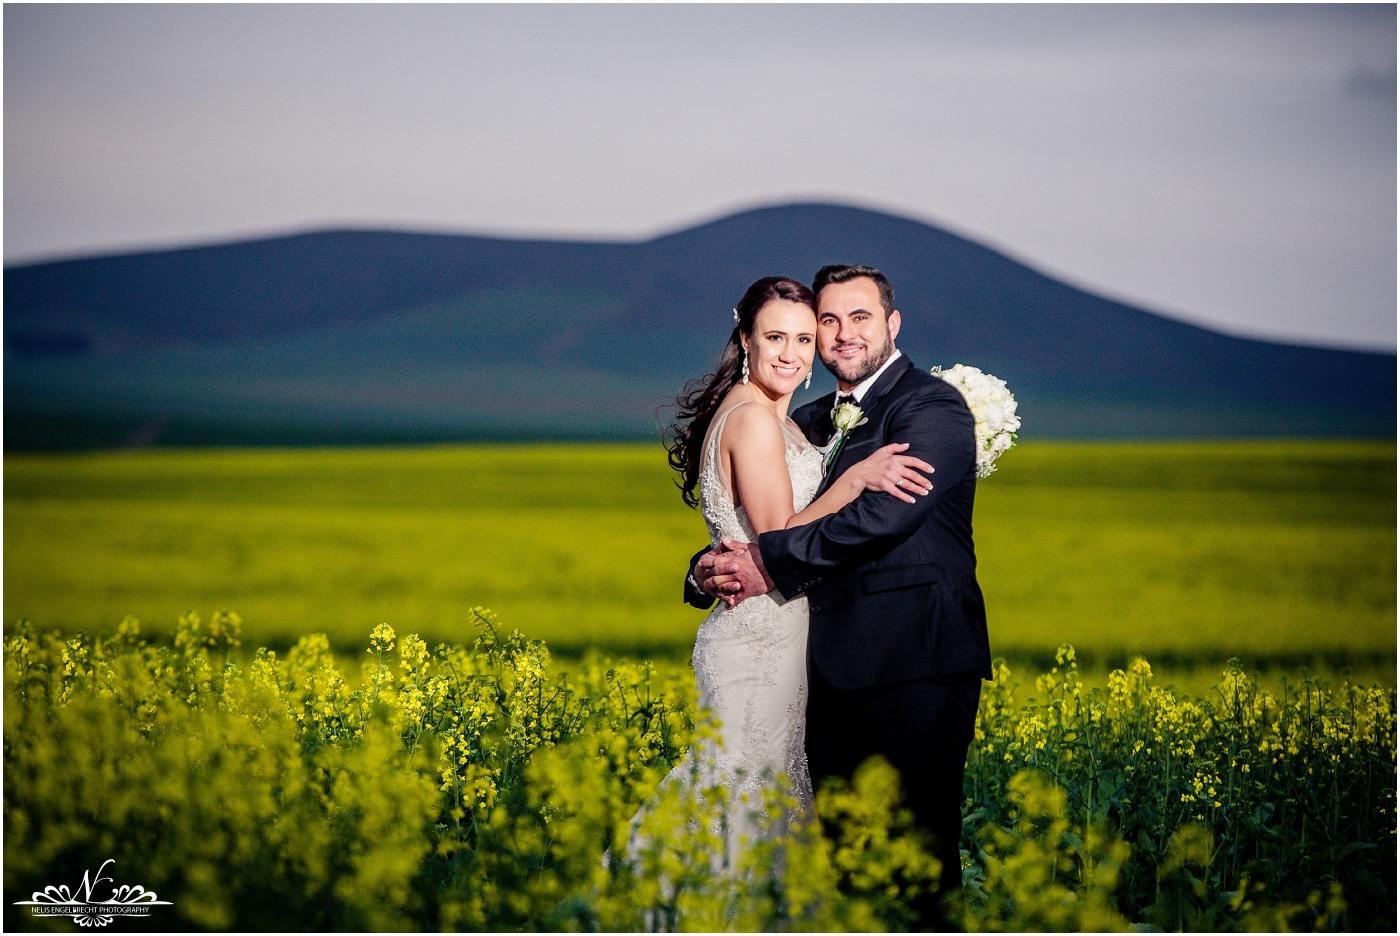 Eensgezind-Wedding-Photos-Nelis-Engelbrecht-Photography-142